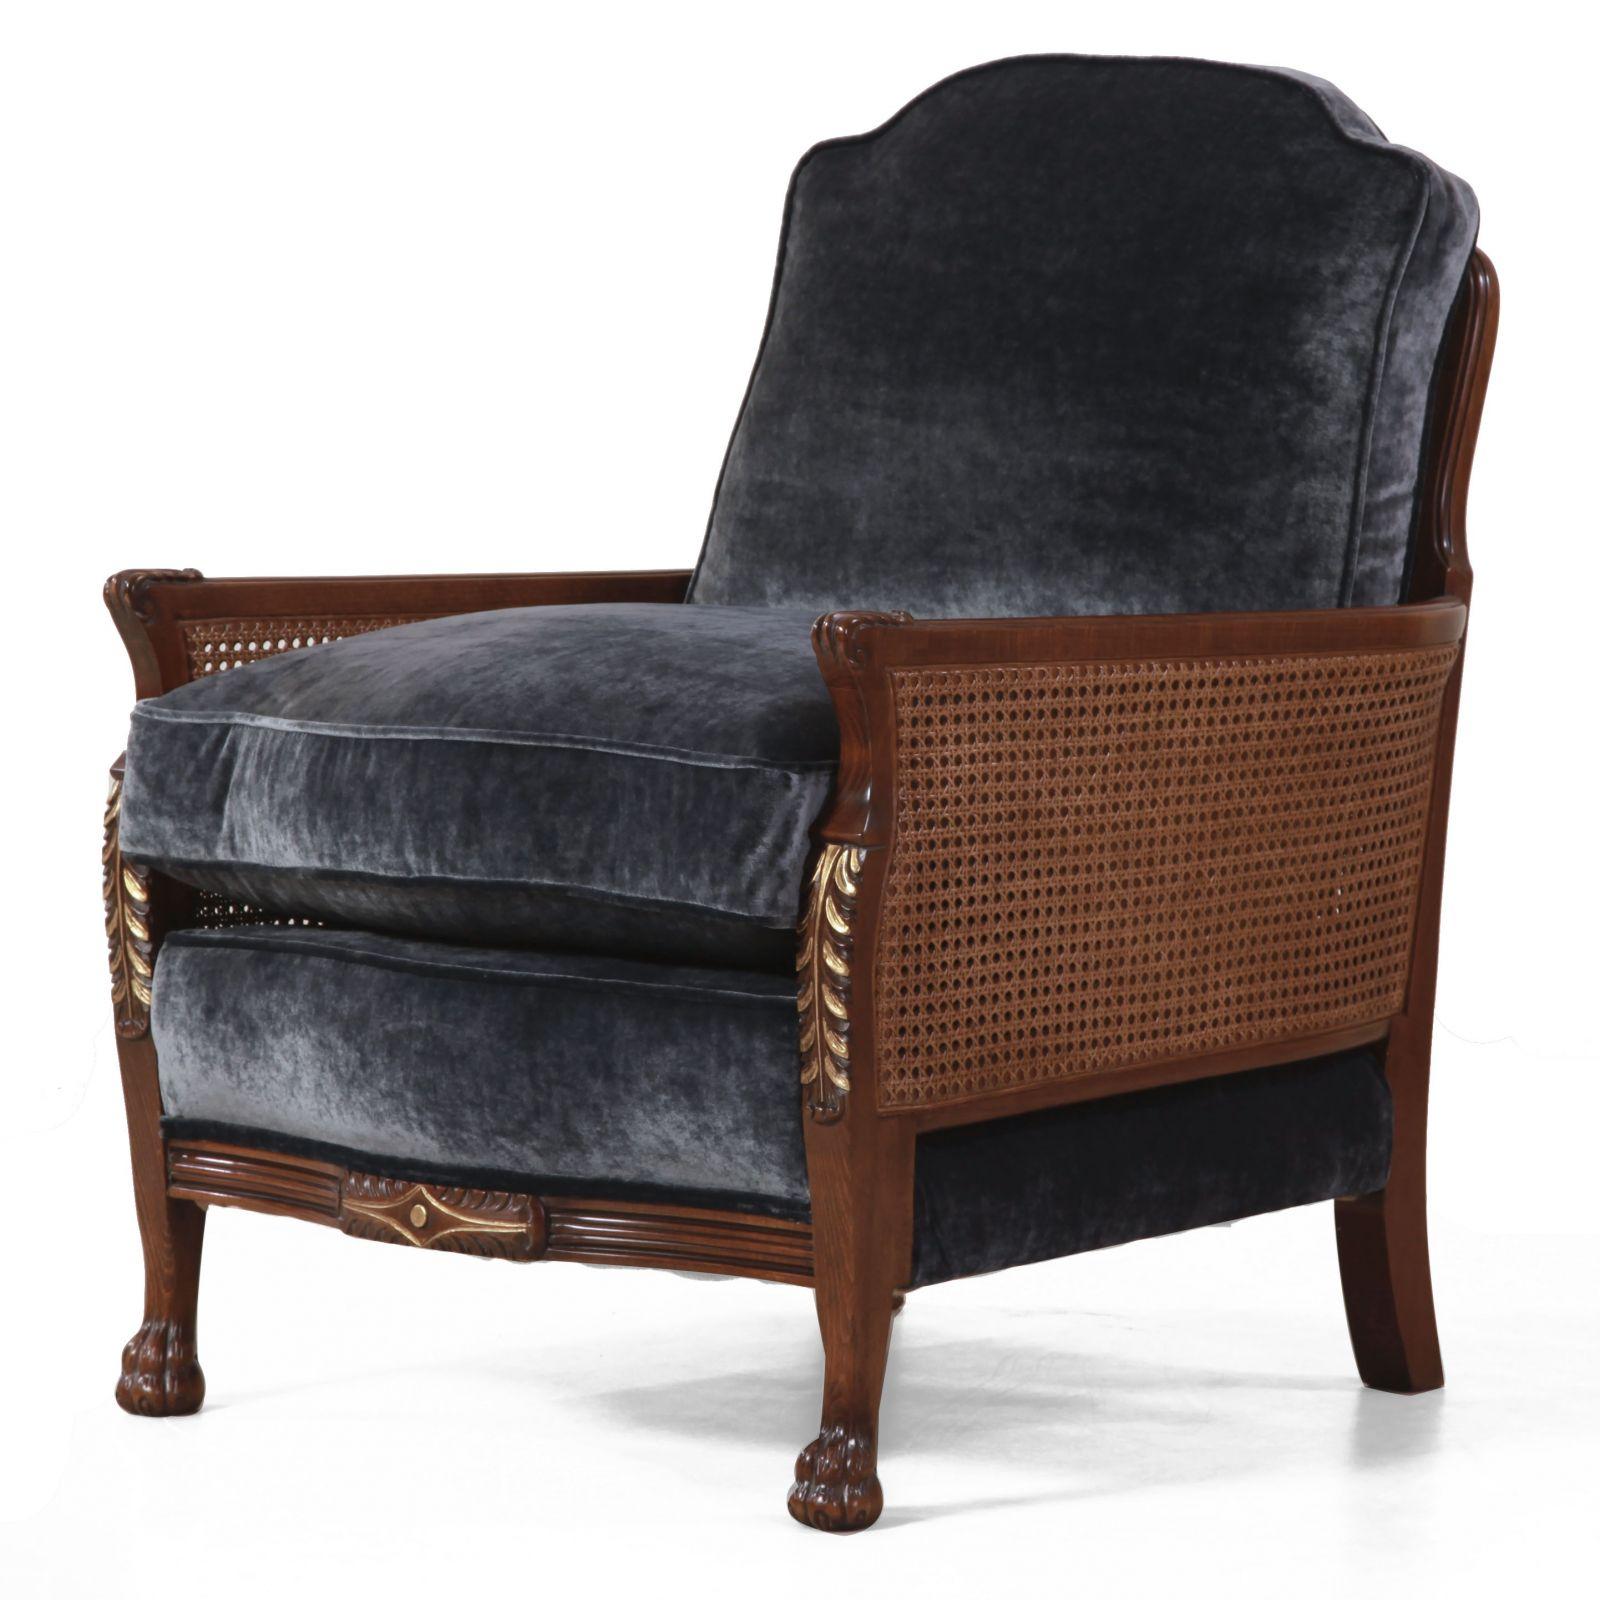 Italian frame Bergere - 2.5 seat sofa + Chair